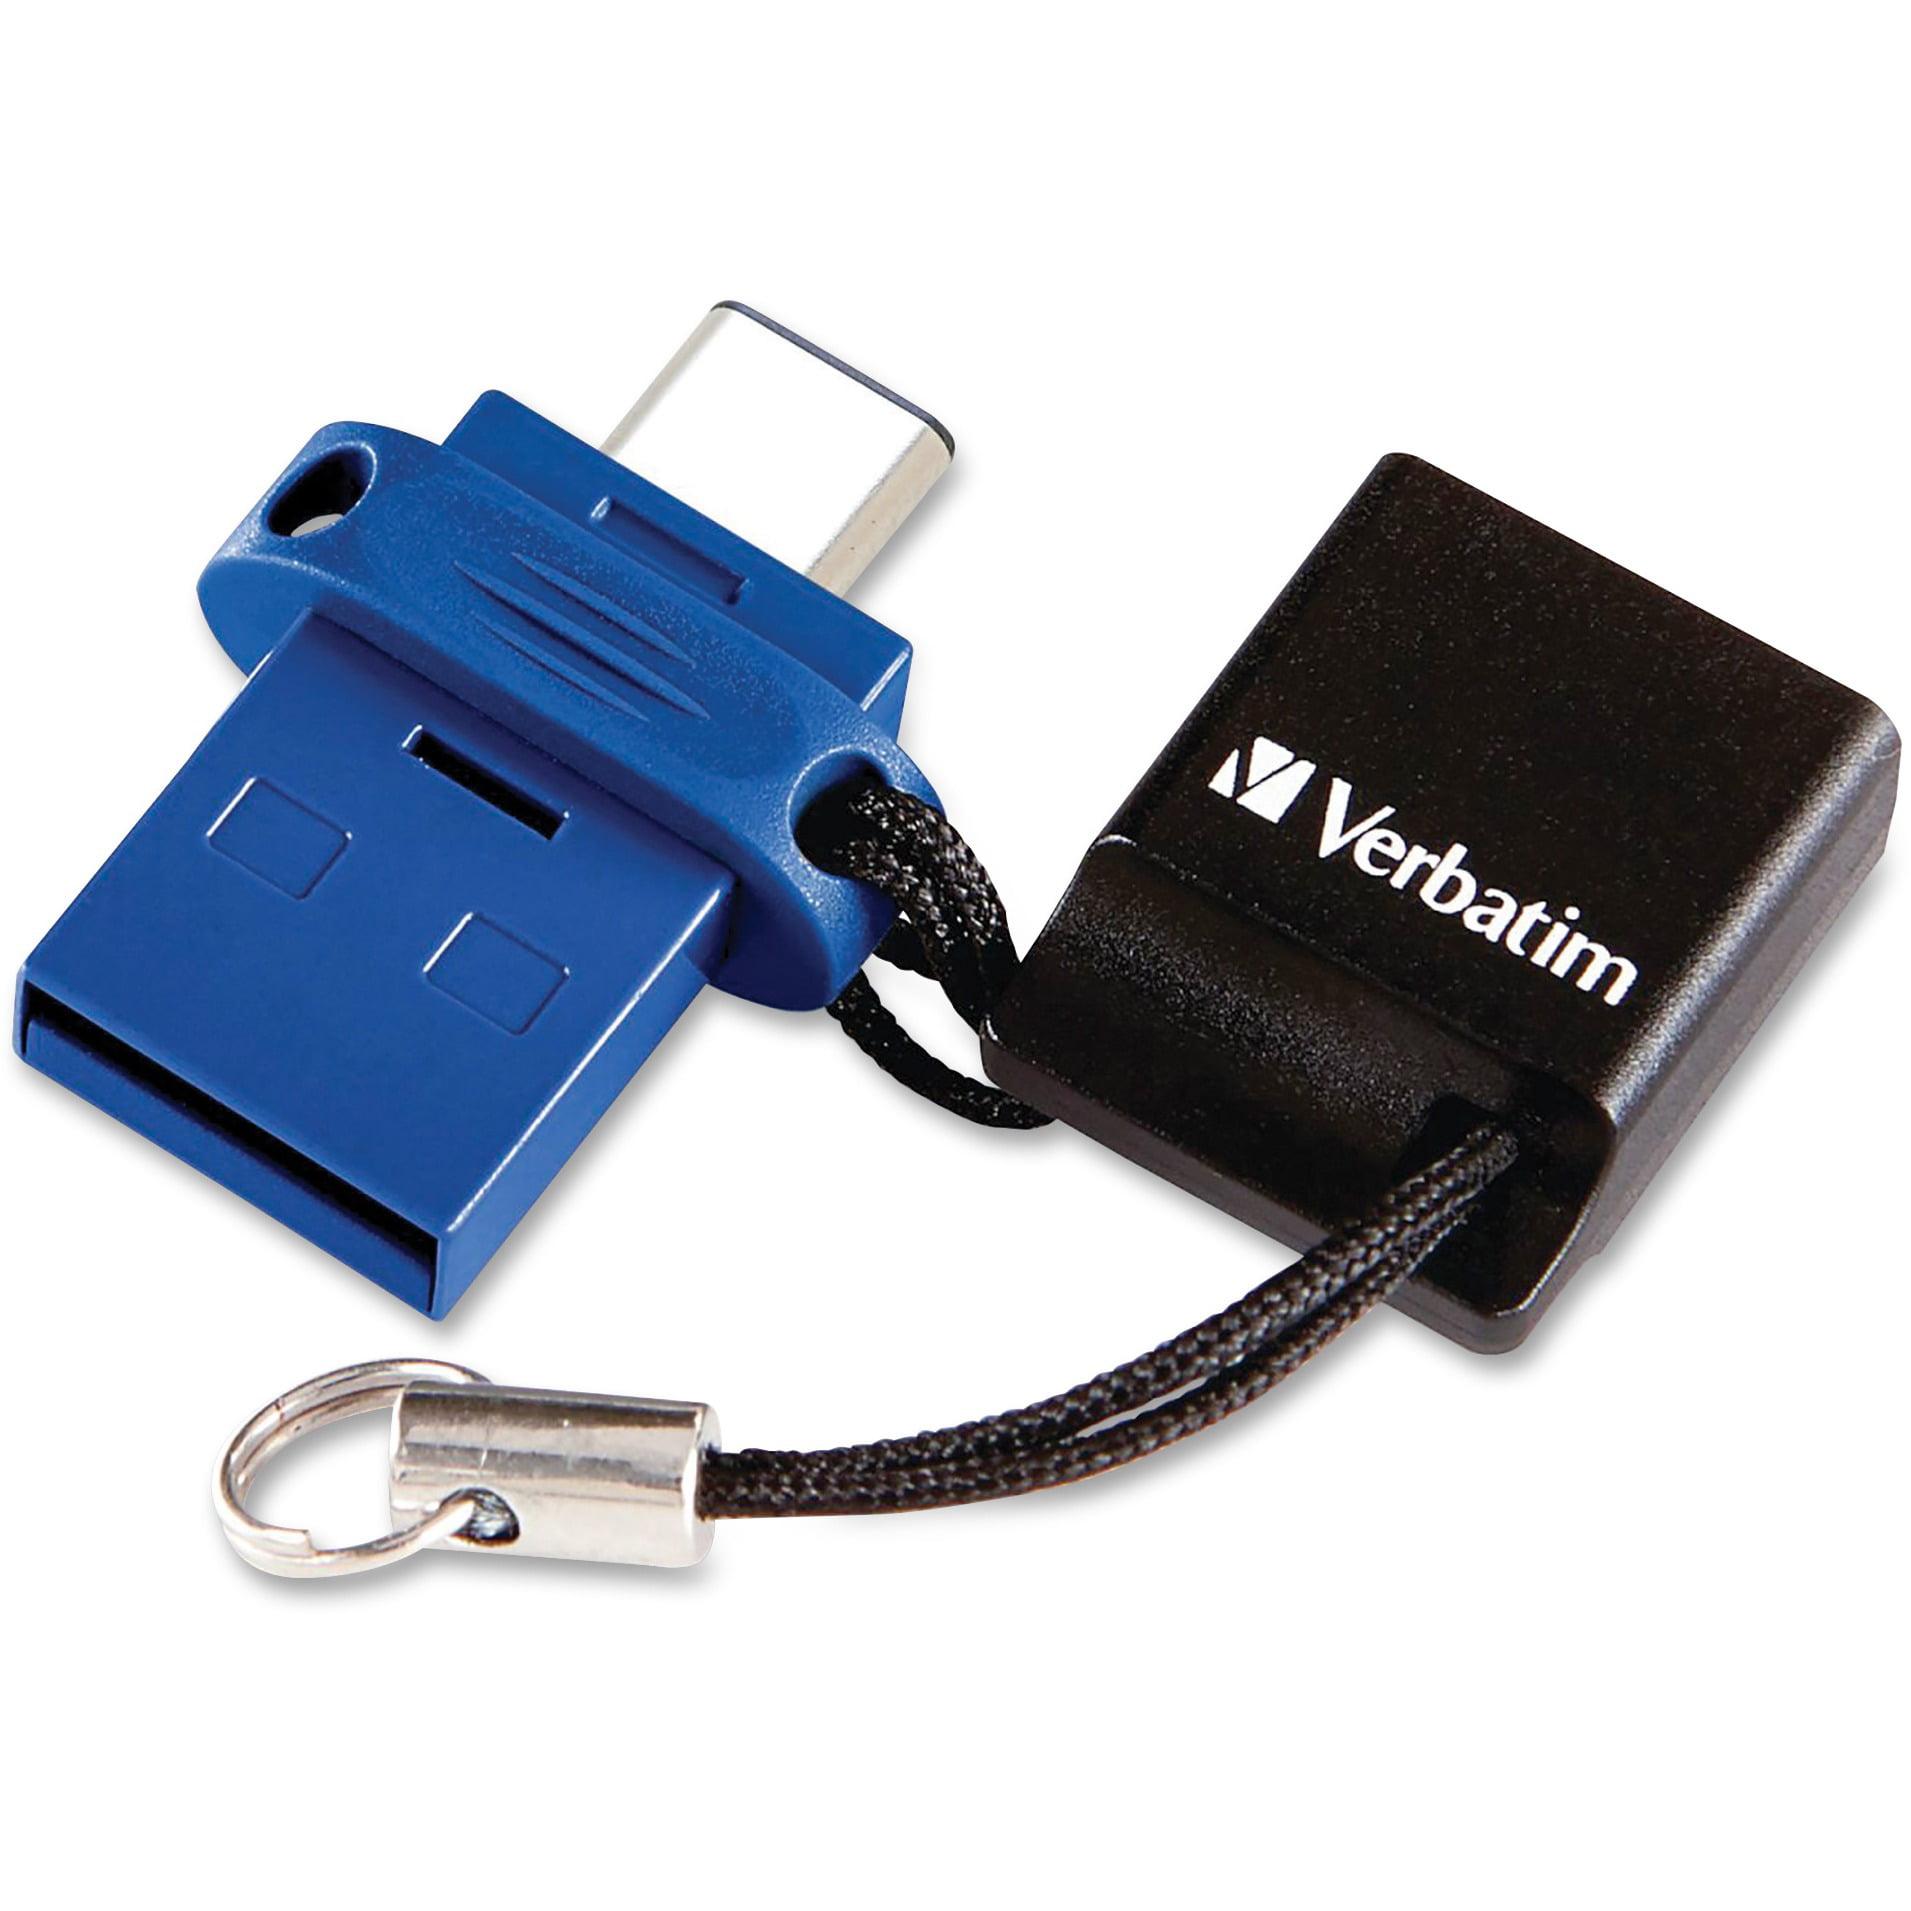 Verbatim, VER99155, USB-C Store 'n' Go Dual USB Flash Drive, 1 Each, Blue